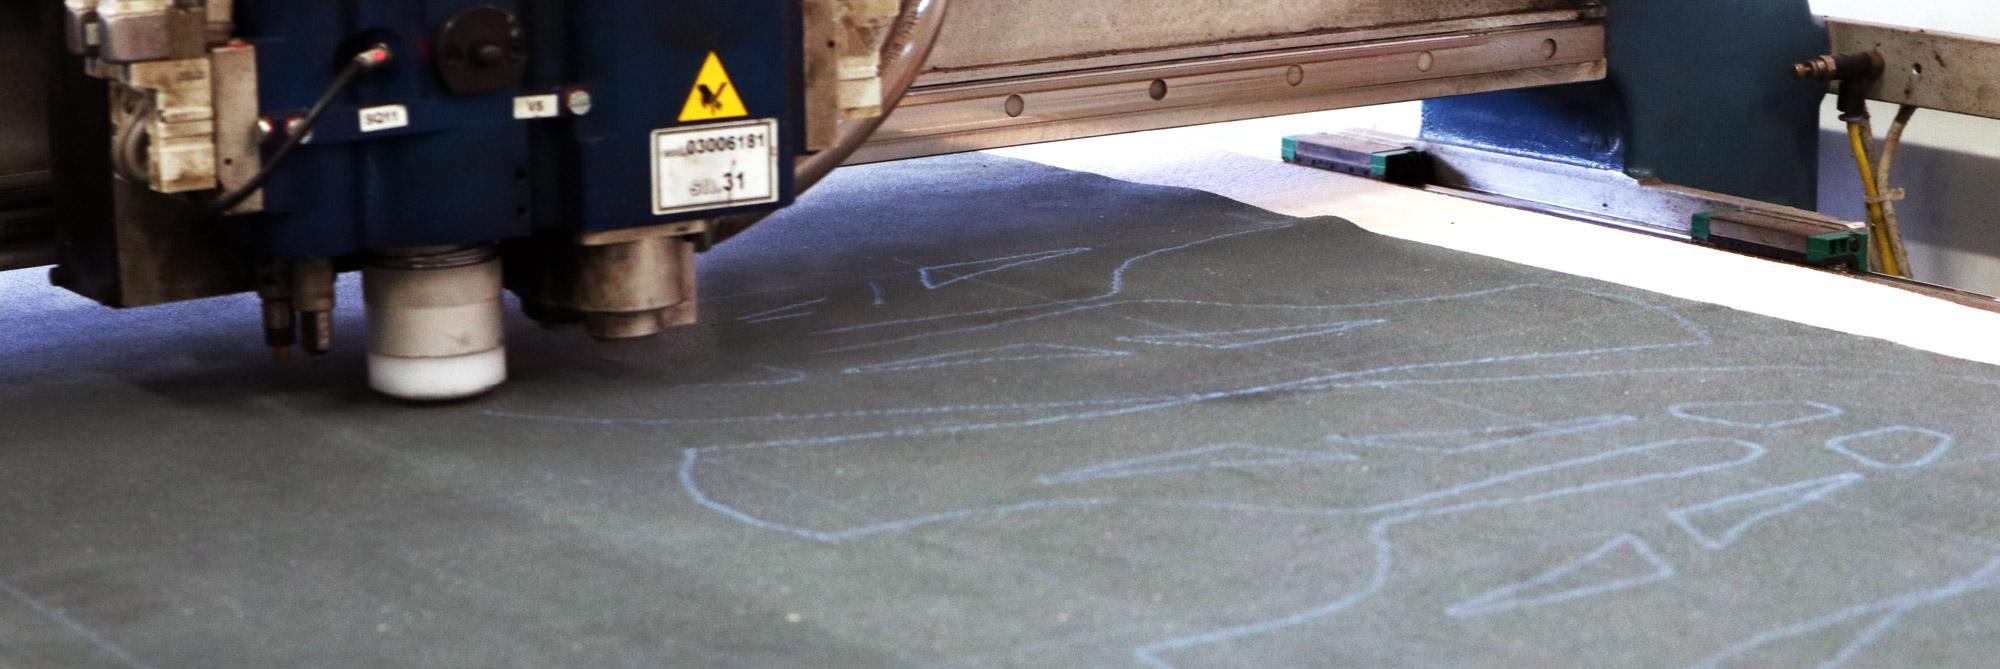 BPL - Marcatura Laser Bergamo